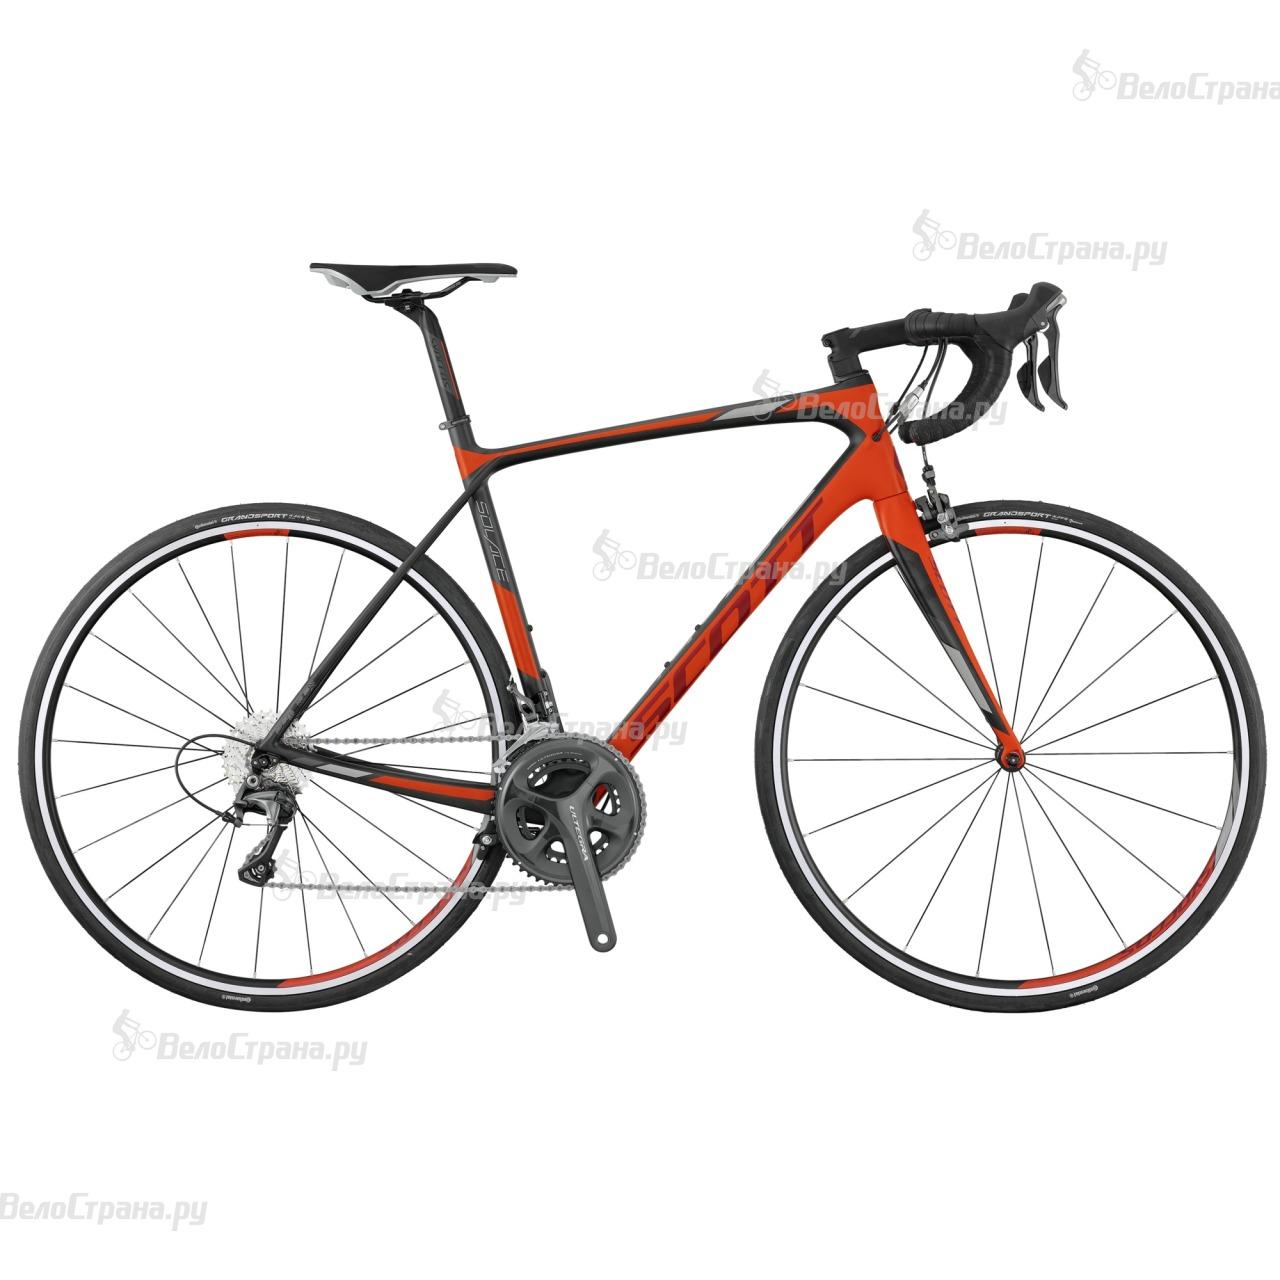 Велосипед Scott Solace 10 Disc (2017) велосипед scott contessa solace 15 disc 2017